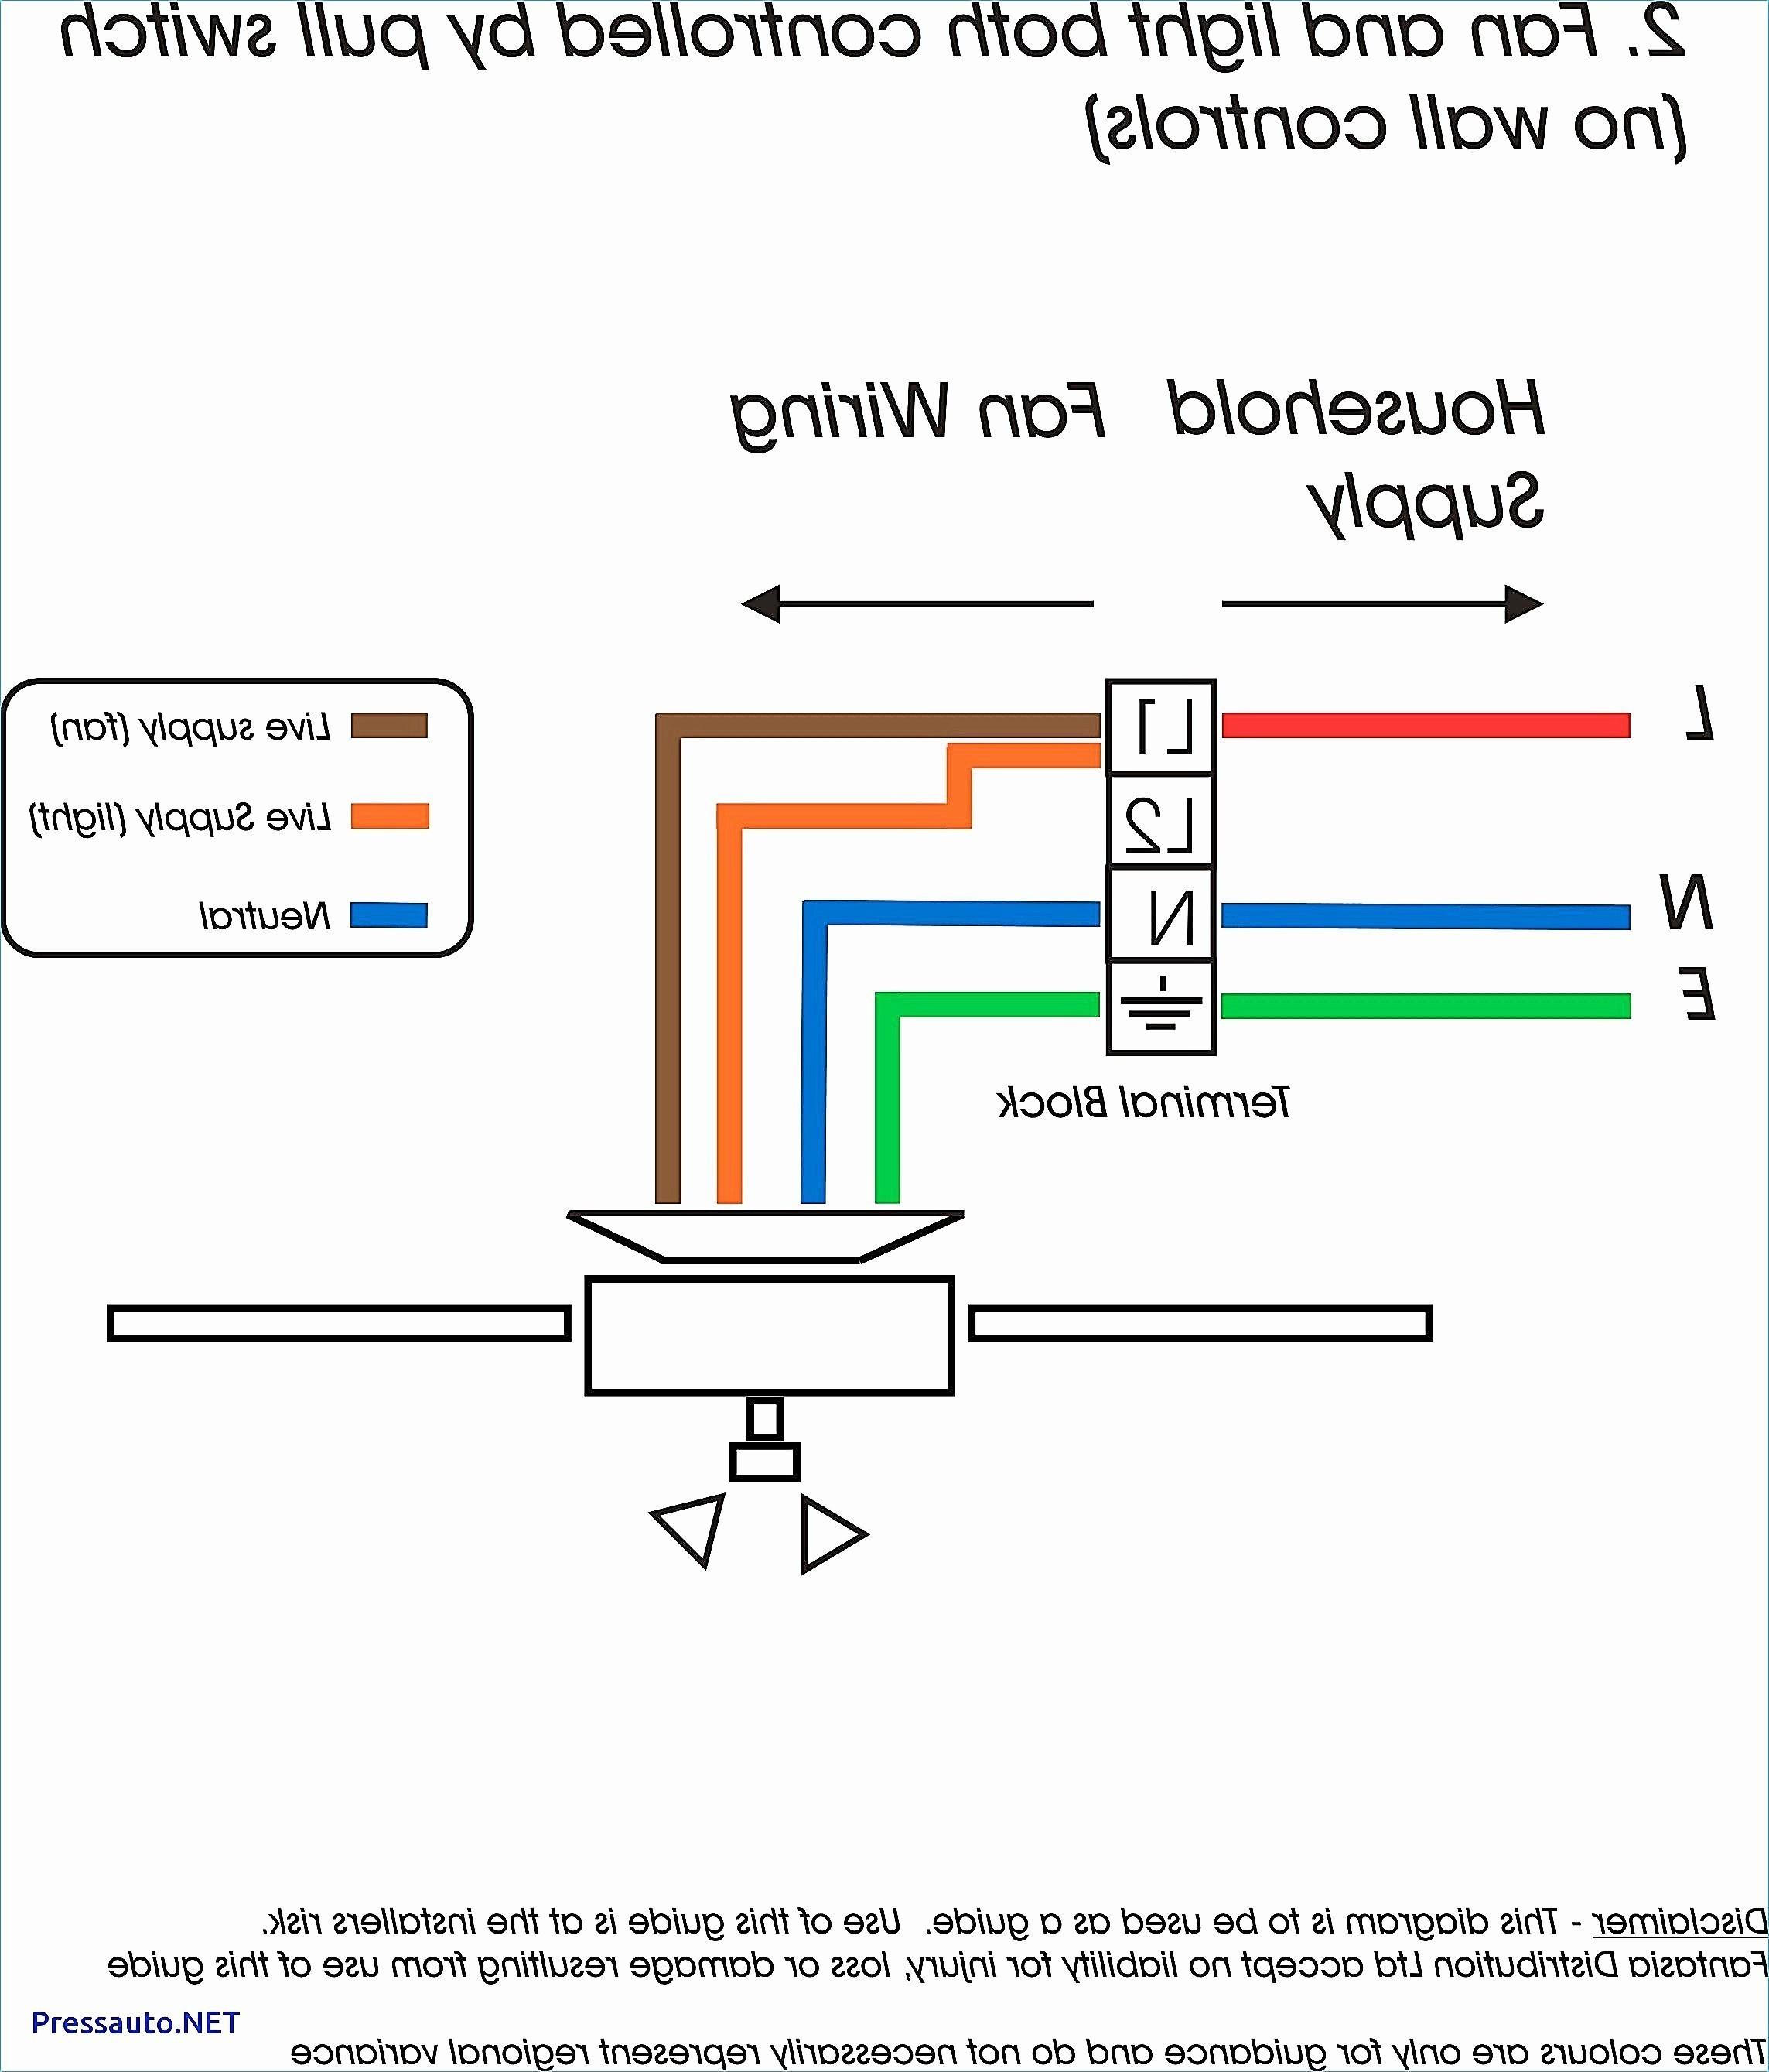 Motorcycle Engine Diagram Honda Beat Motorcycle Wiring Diagram Fresh Honda Beat Motorcycle Of Motorcycle Engine Diagram